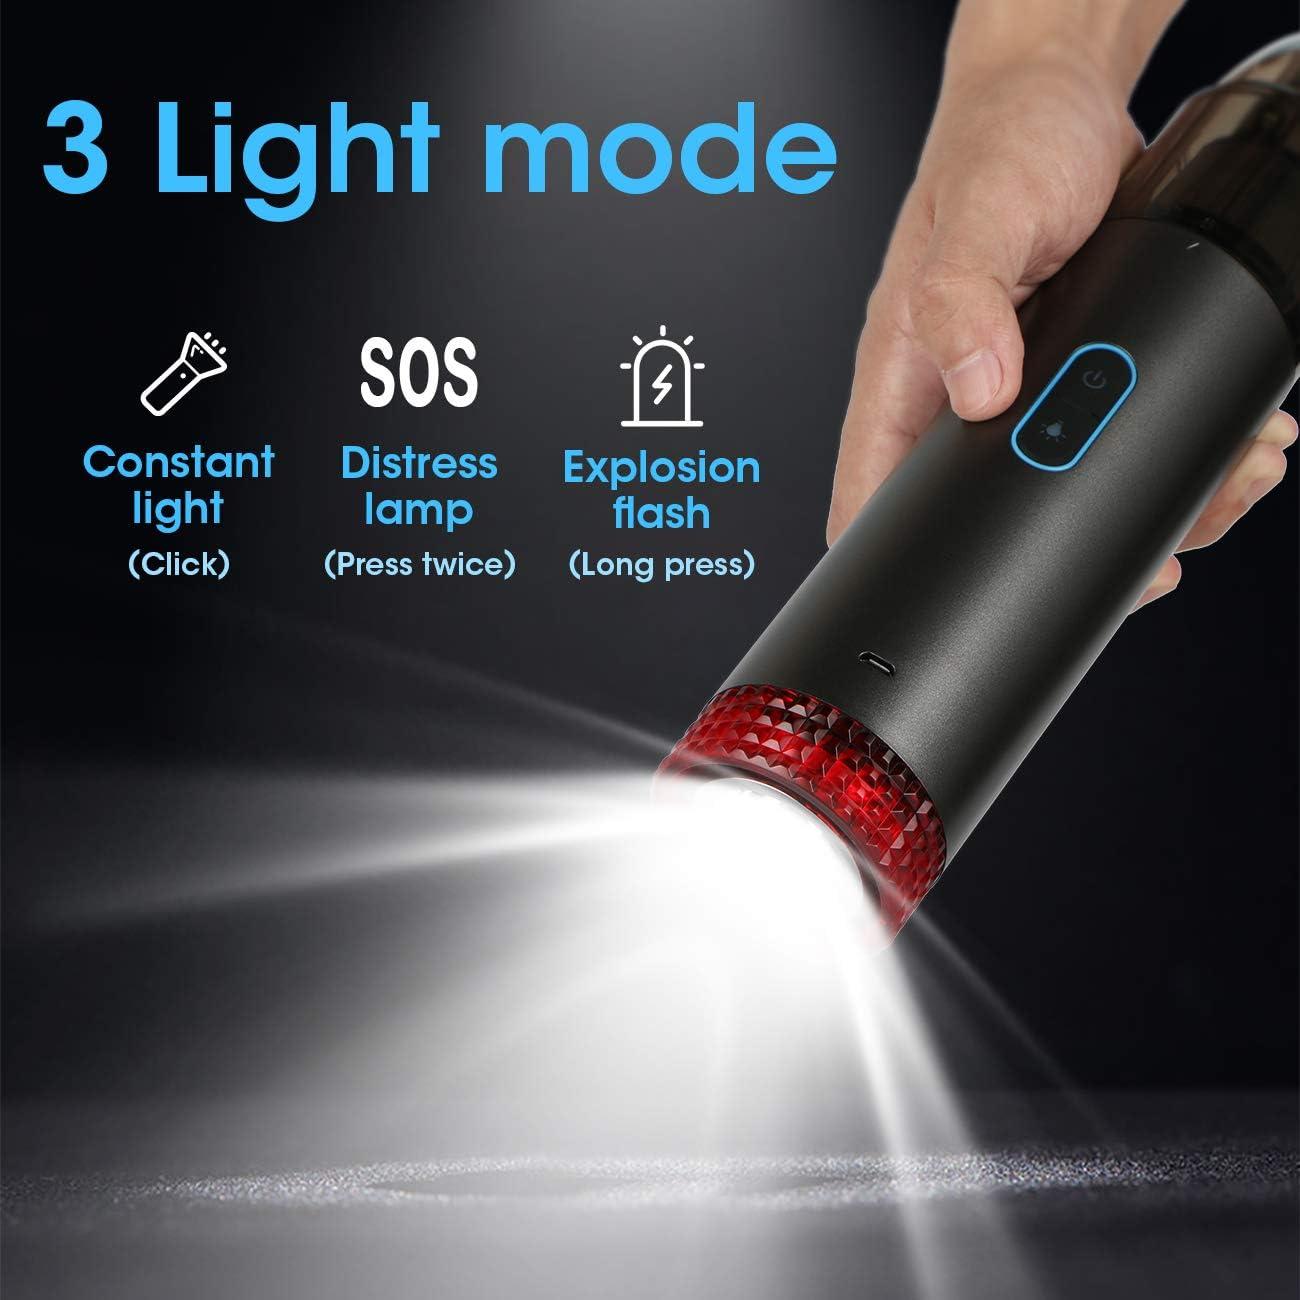 Sucastle Handstaubsauger,Akku Handstaubsauger tragbarer Mini-USB-Ladeger/ät f/ür Staubsauger mit Au/ßenbeleuchtung,Akkusauger Kabellos,Mini Staubsauger Autostaubsauger f/ür jede Ecke von Auto und Familie